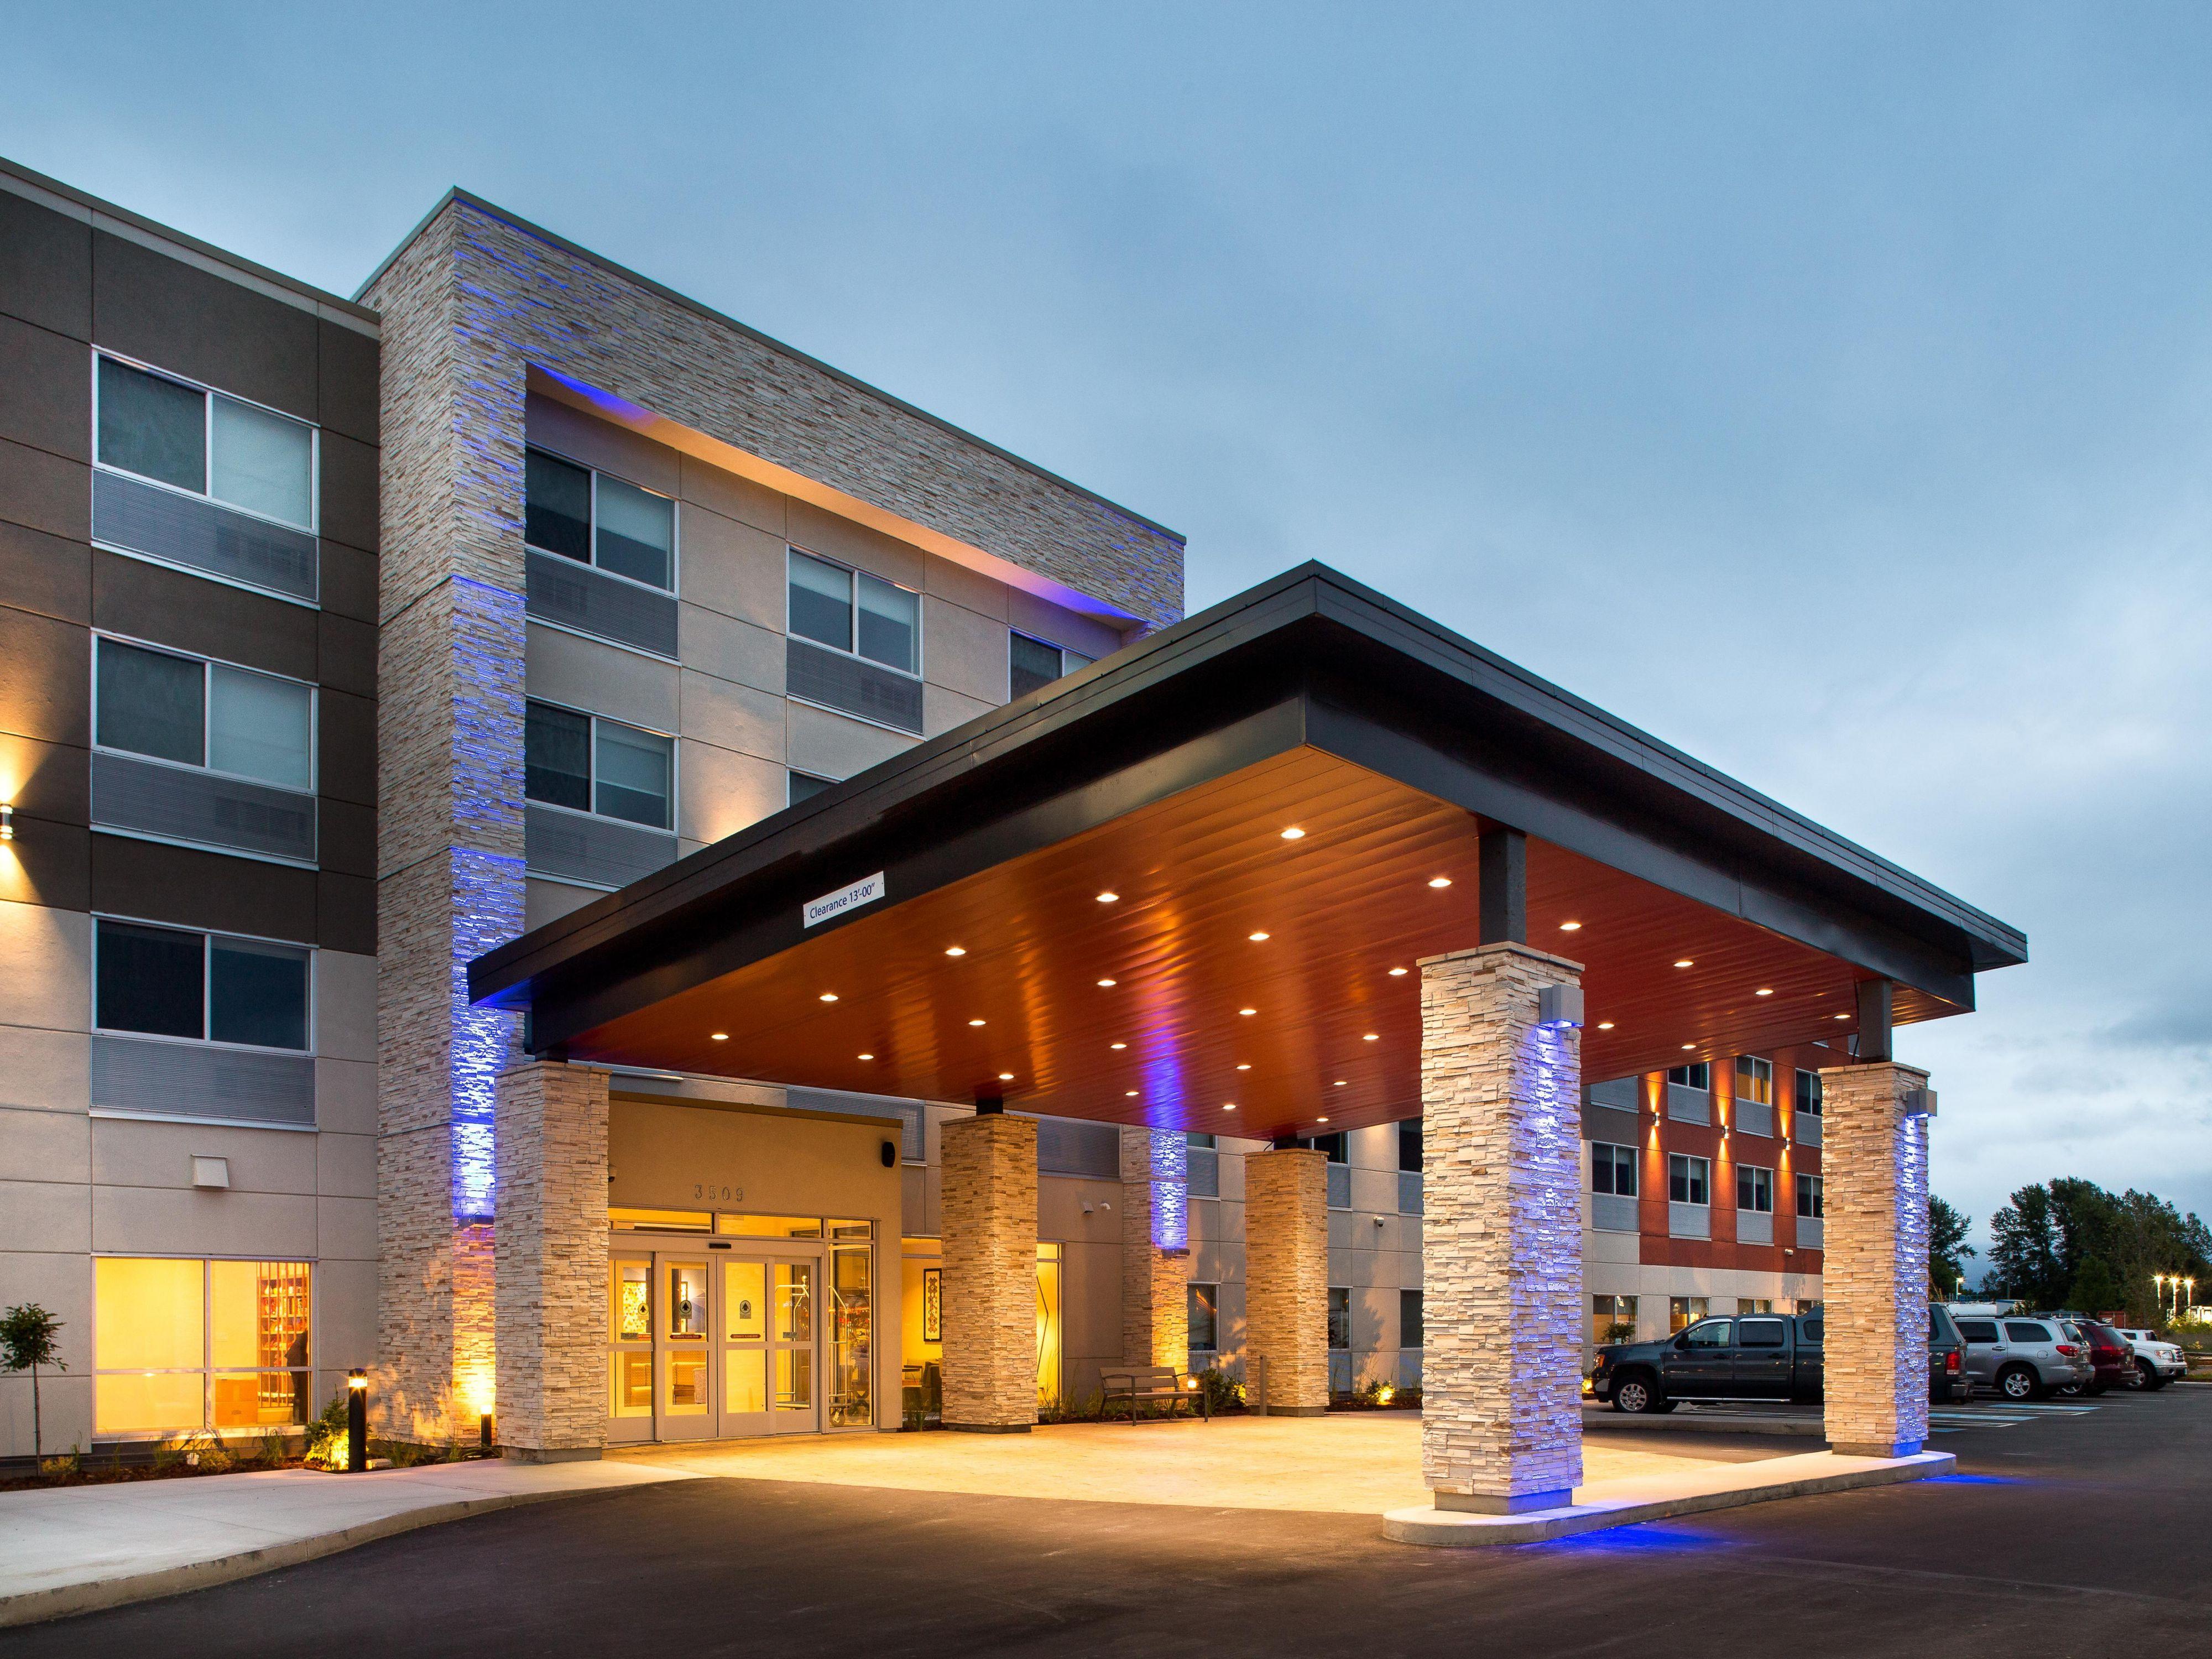 & Holiday Inn Express u0026 Suites Terrace Hotel by IHG